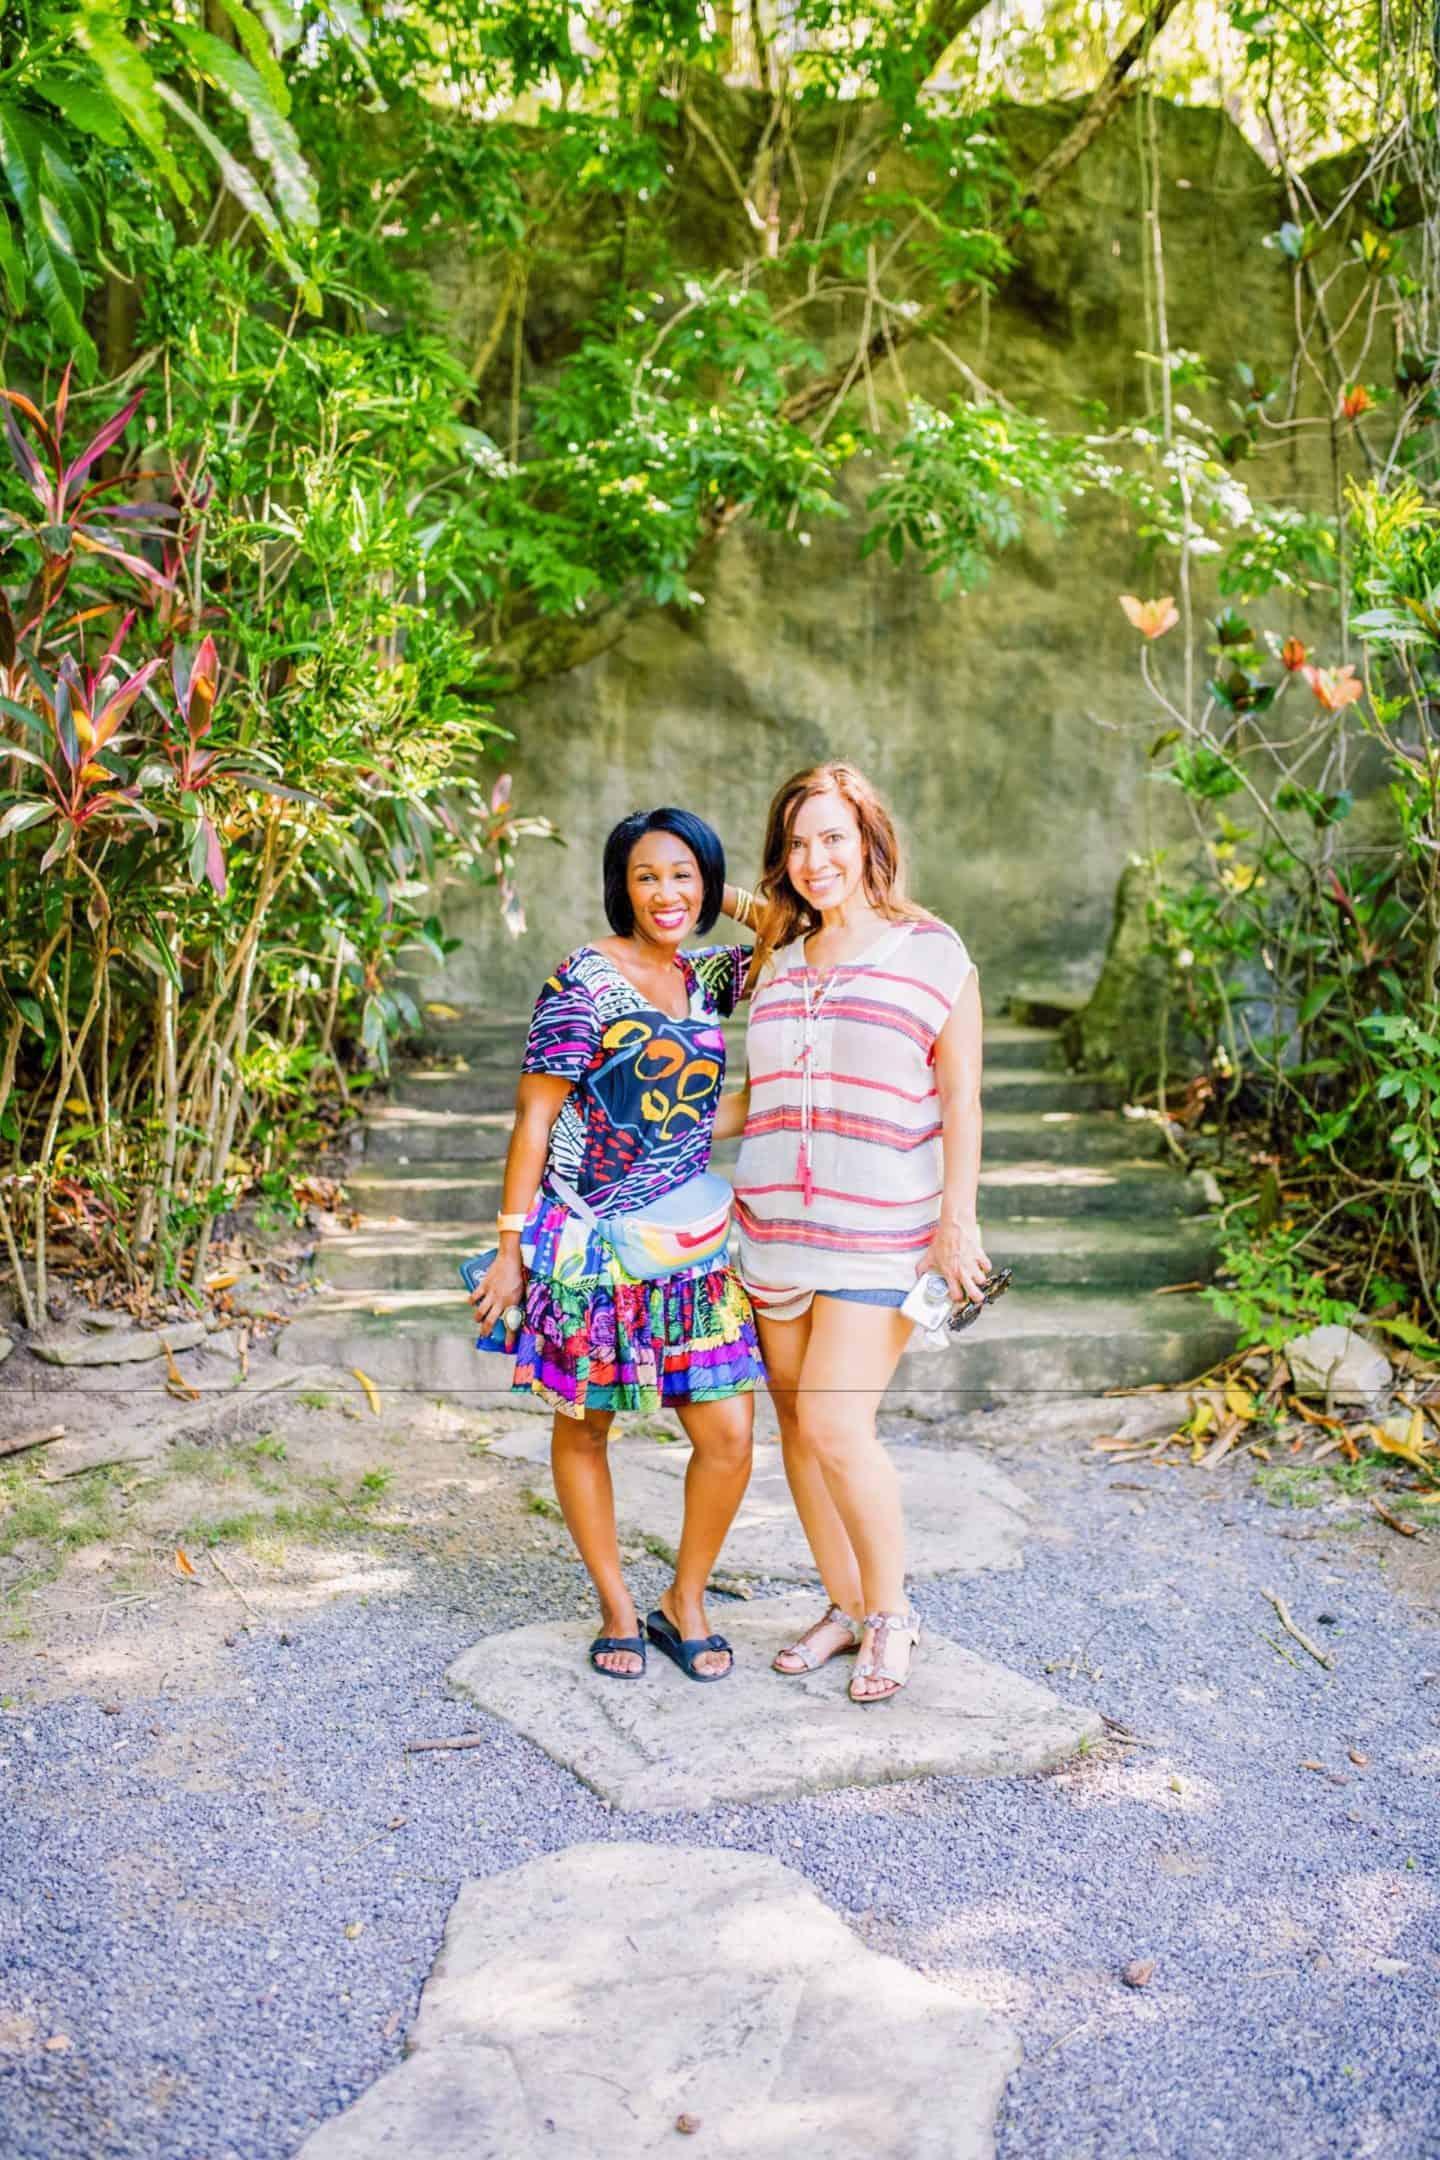 Shaunda Necole with Yvette of May Bueno Cooking in Honduras